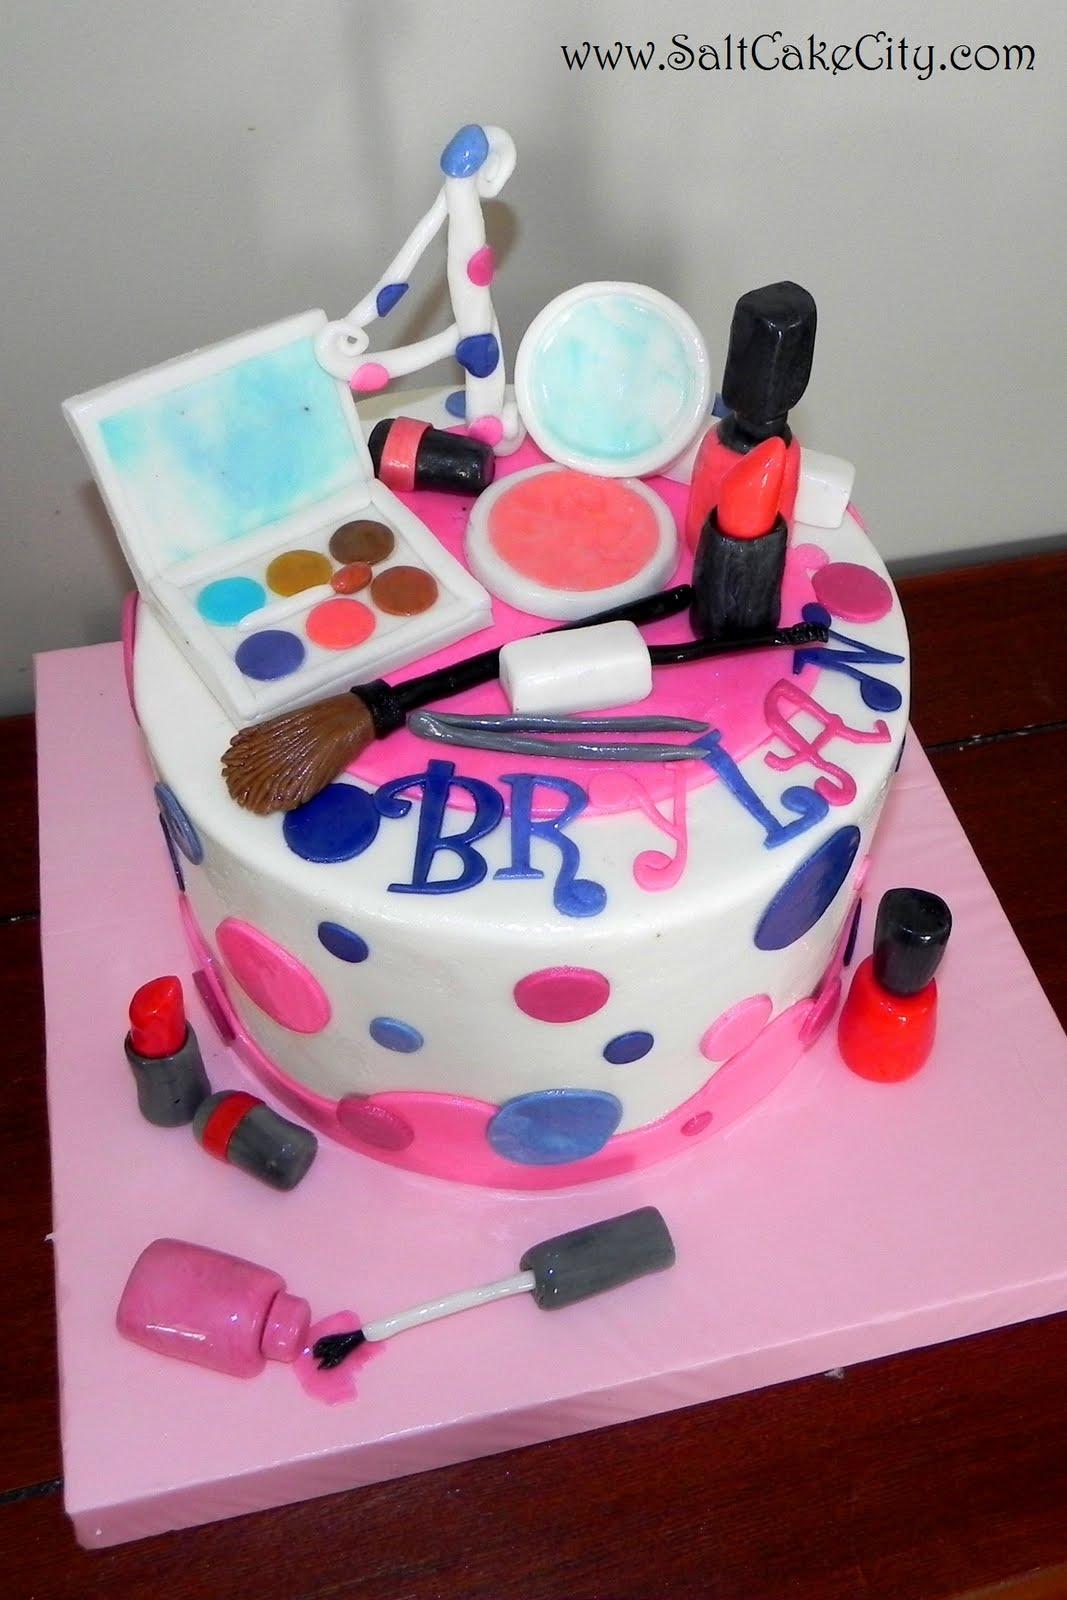 Let Them Eat Cake: Make up cake